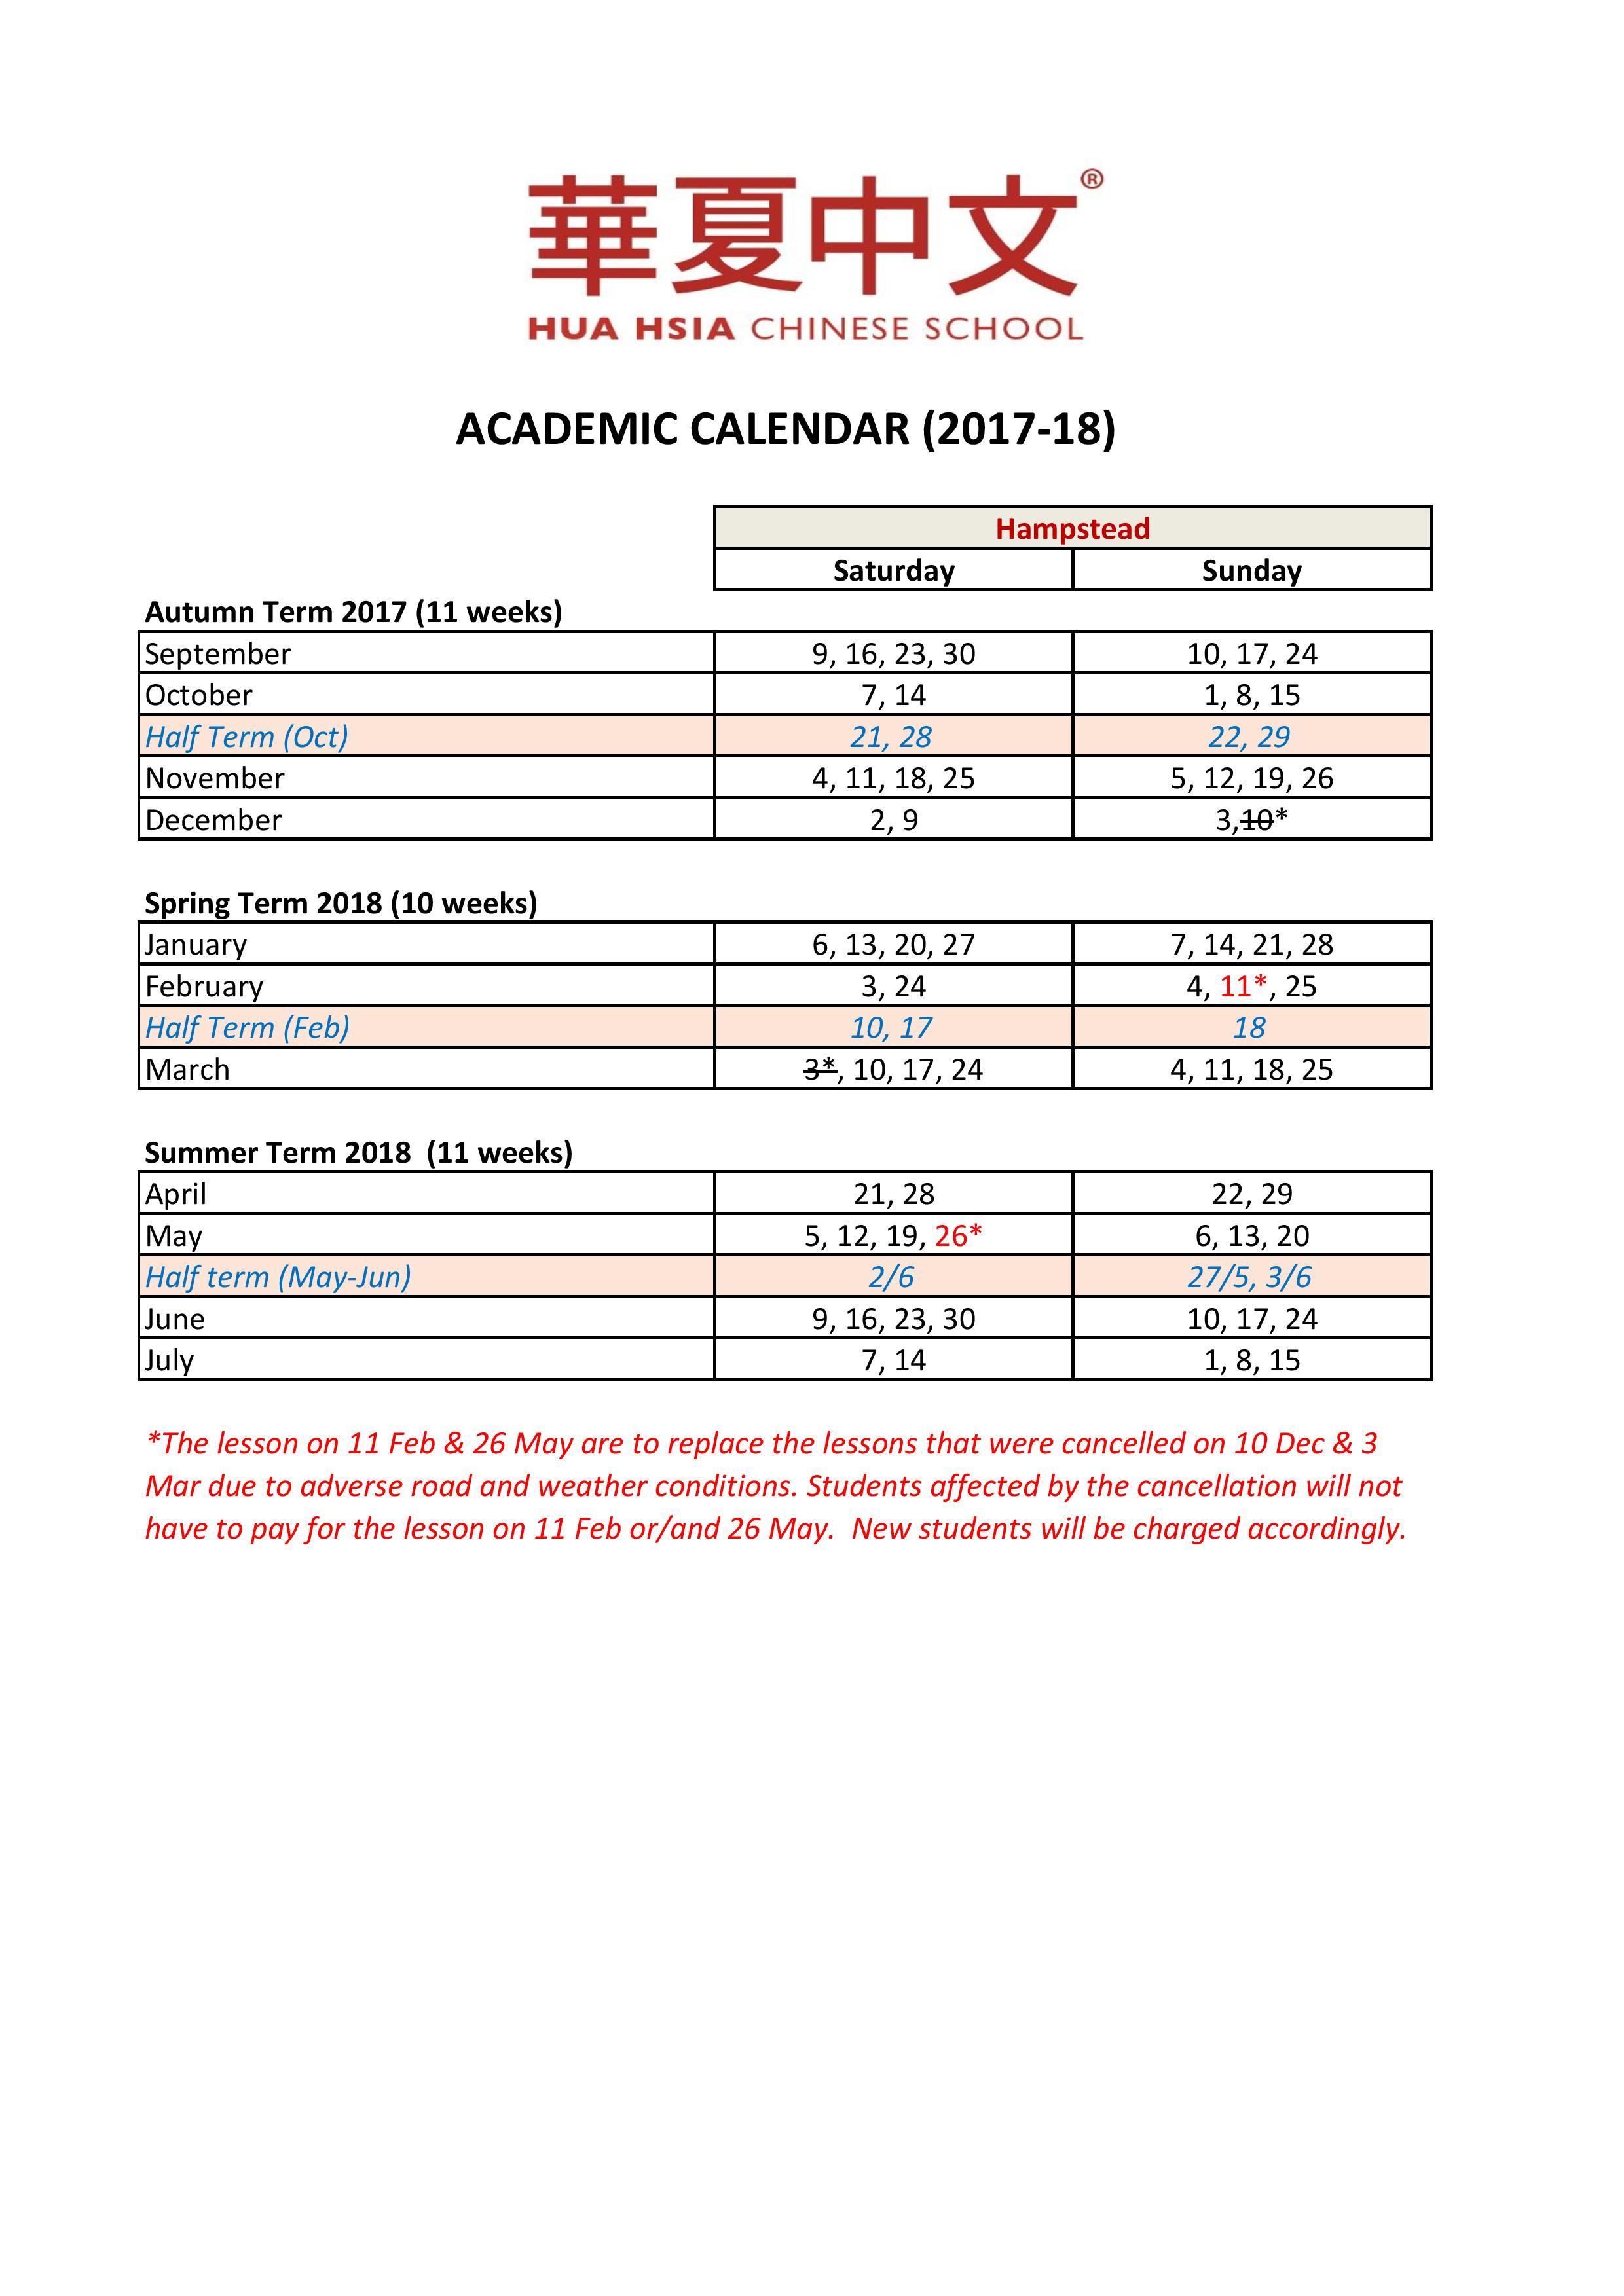 Academic Calendar (2017-18) – Hampstead-page-001 (1)